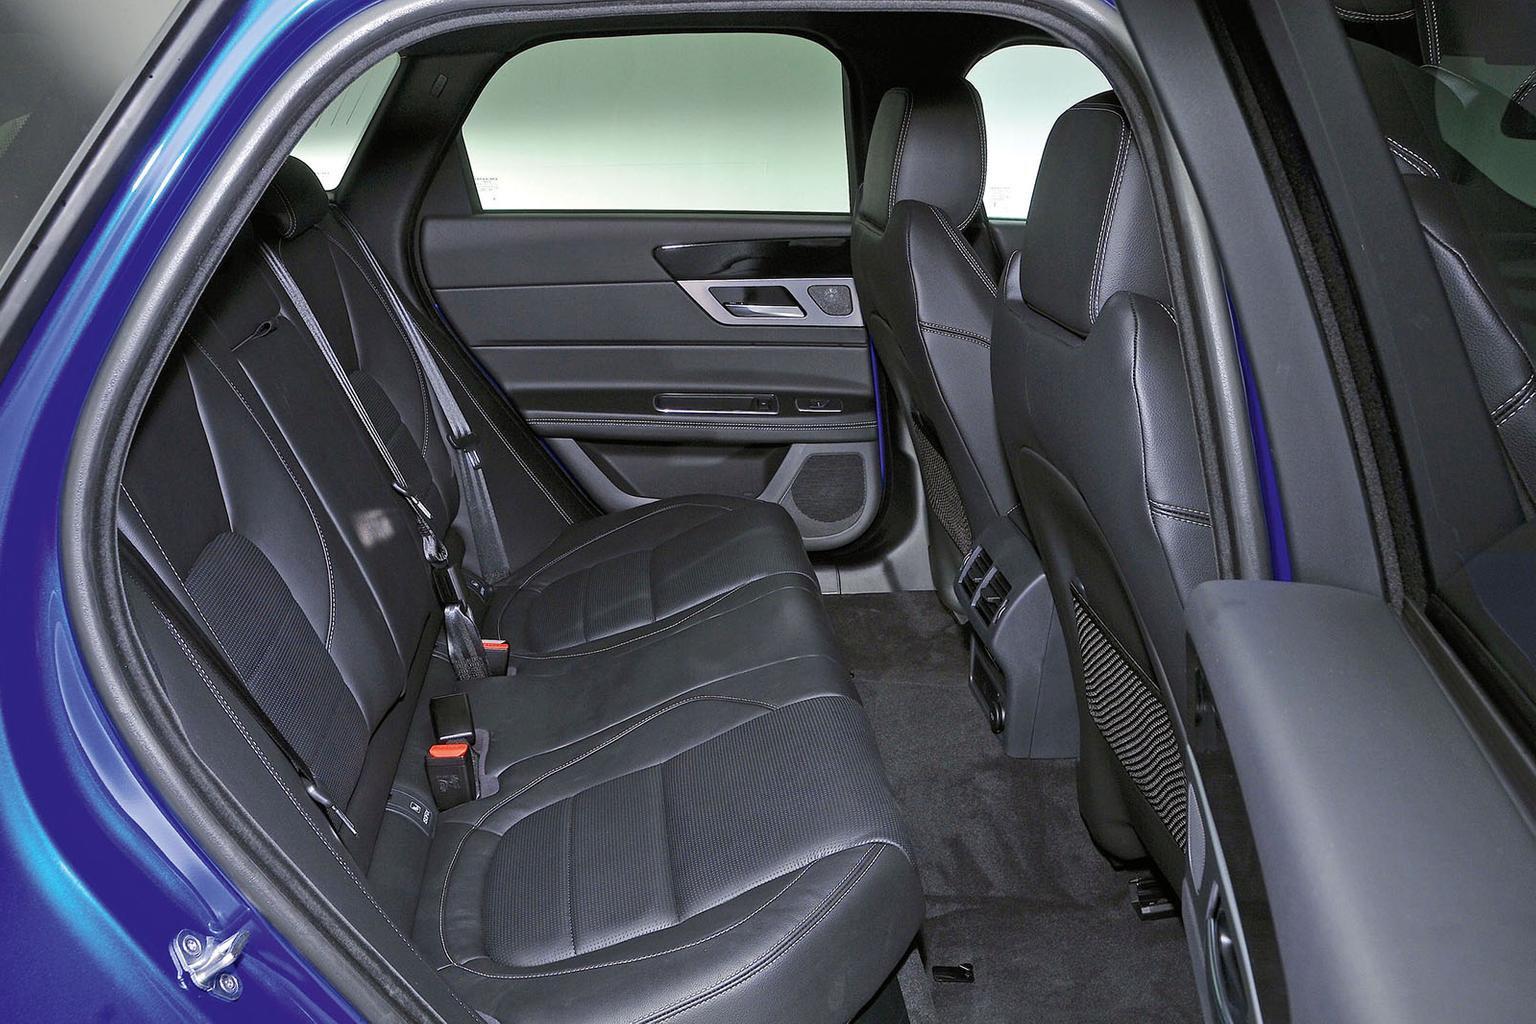 New Jaguar XF Sportbrake vs BMW 5 Series Touring